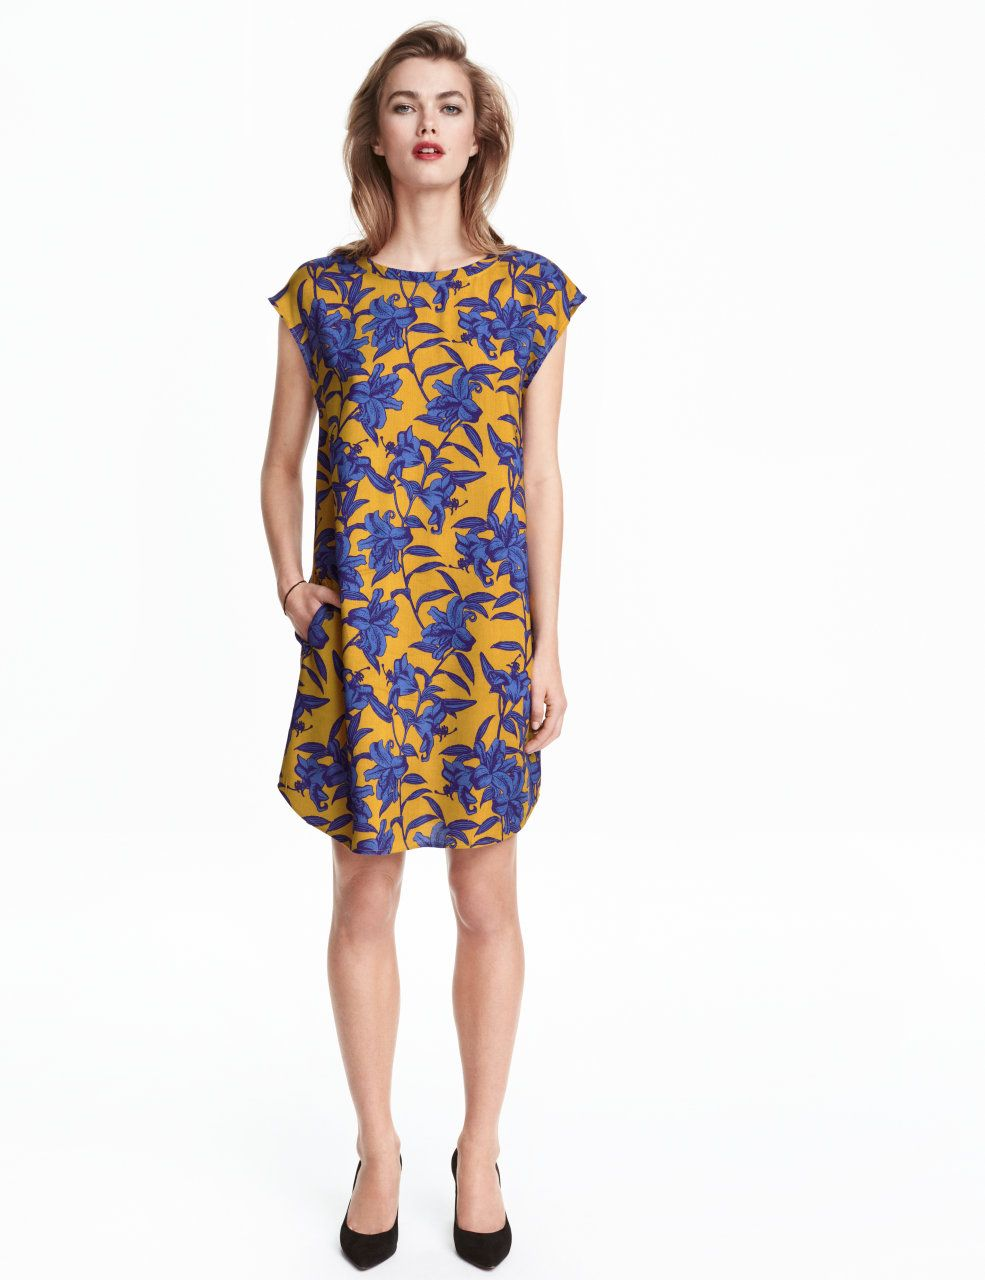 abf2184103cb6 Patterned Dress | Mustard yellow/patterned | Ladies | H&M US ...